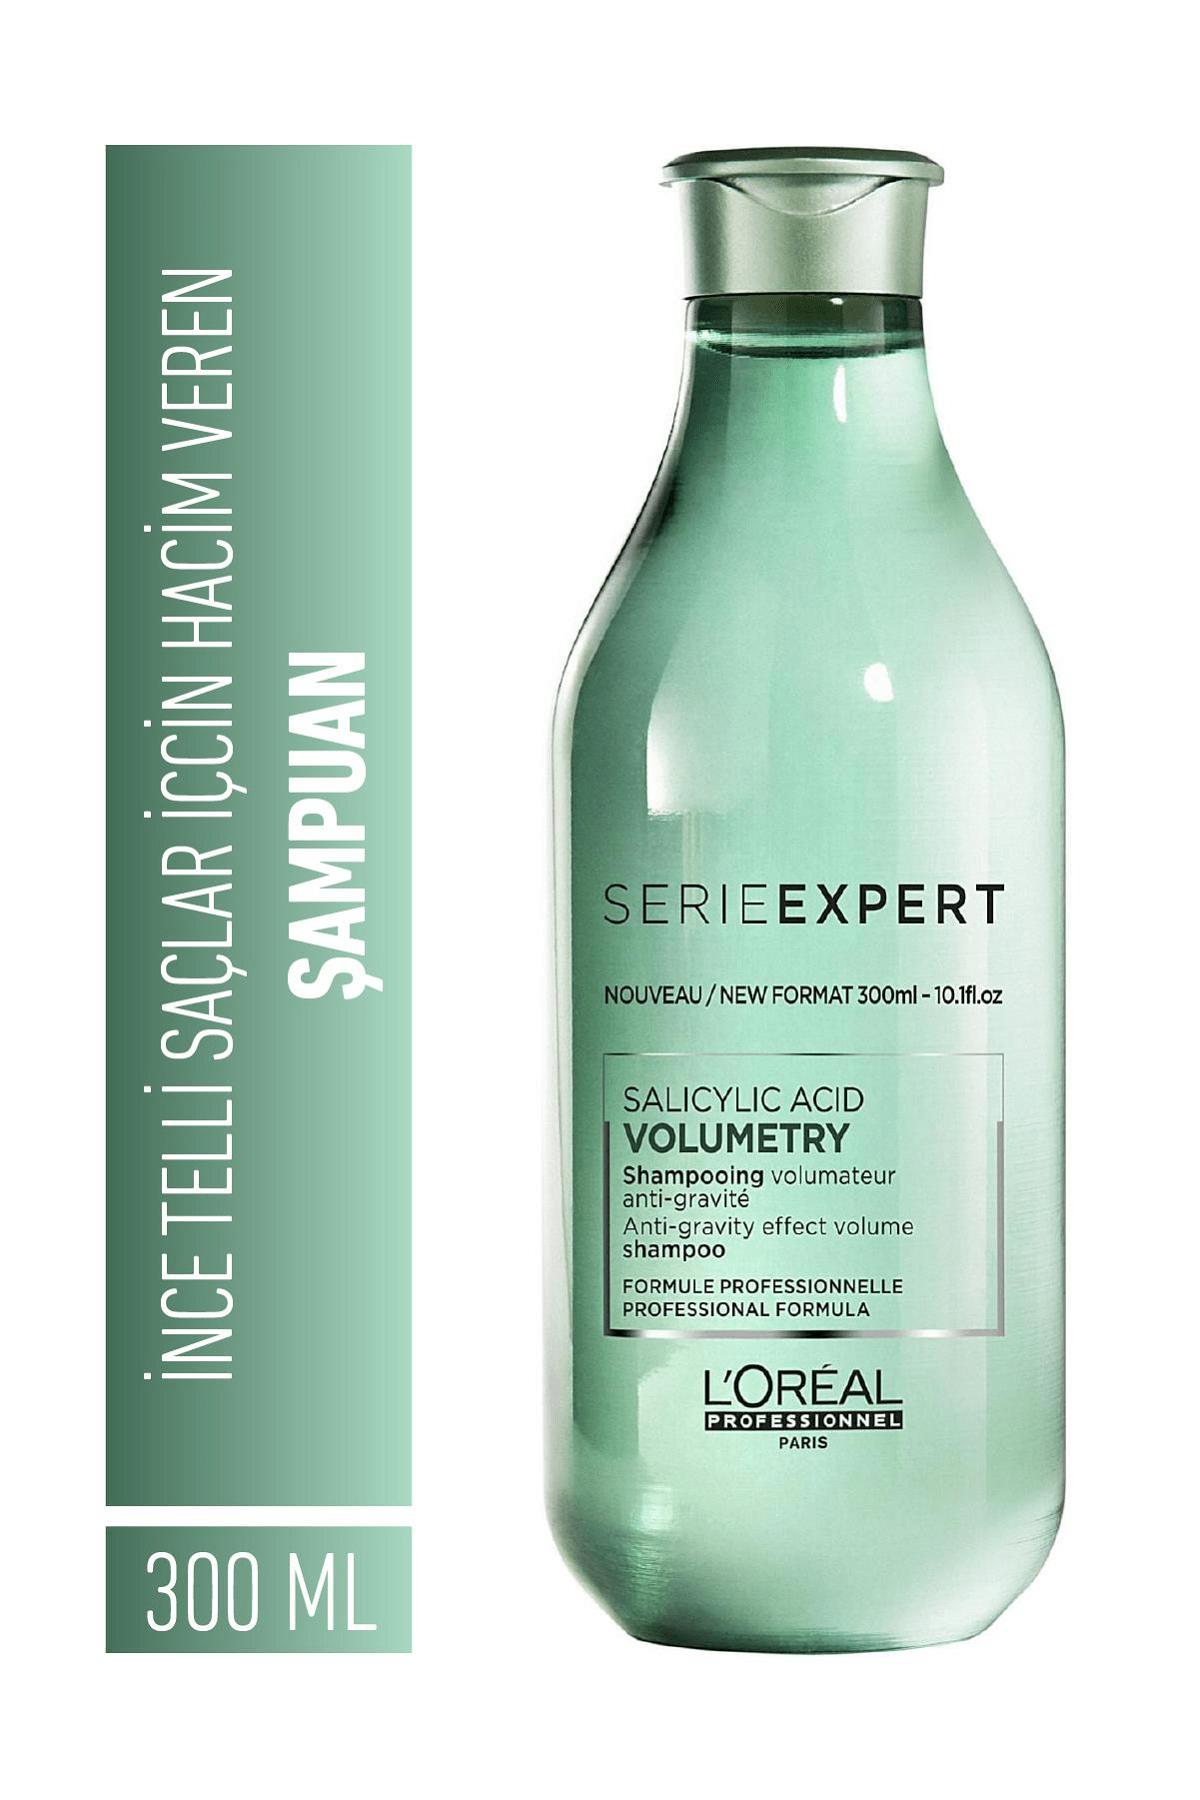 L'oreal Professionnel Serie Expert Volumetry İnce Telli Saçlar için Hacim Veren Şampuan 300 ml